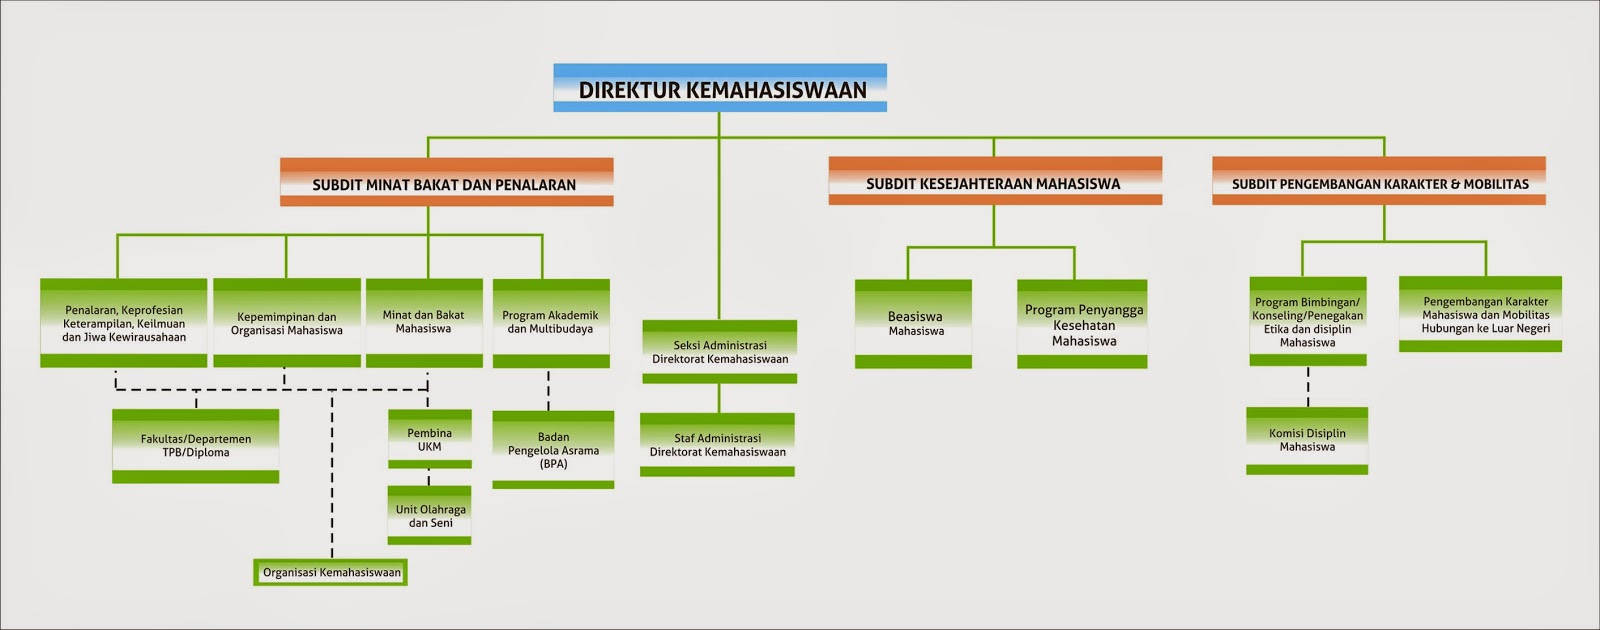 struktur organisasi toyota Struktur organisasi akan membantu perusahaan otomotif ford memiliki struktur organisasi yang tinggi dengan 15 tingkatan manajer, sementara toyota relatif.